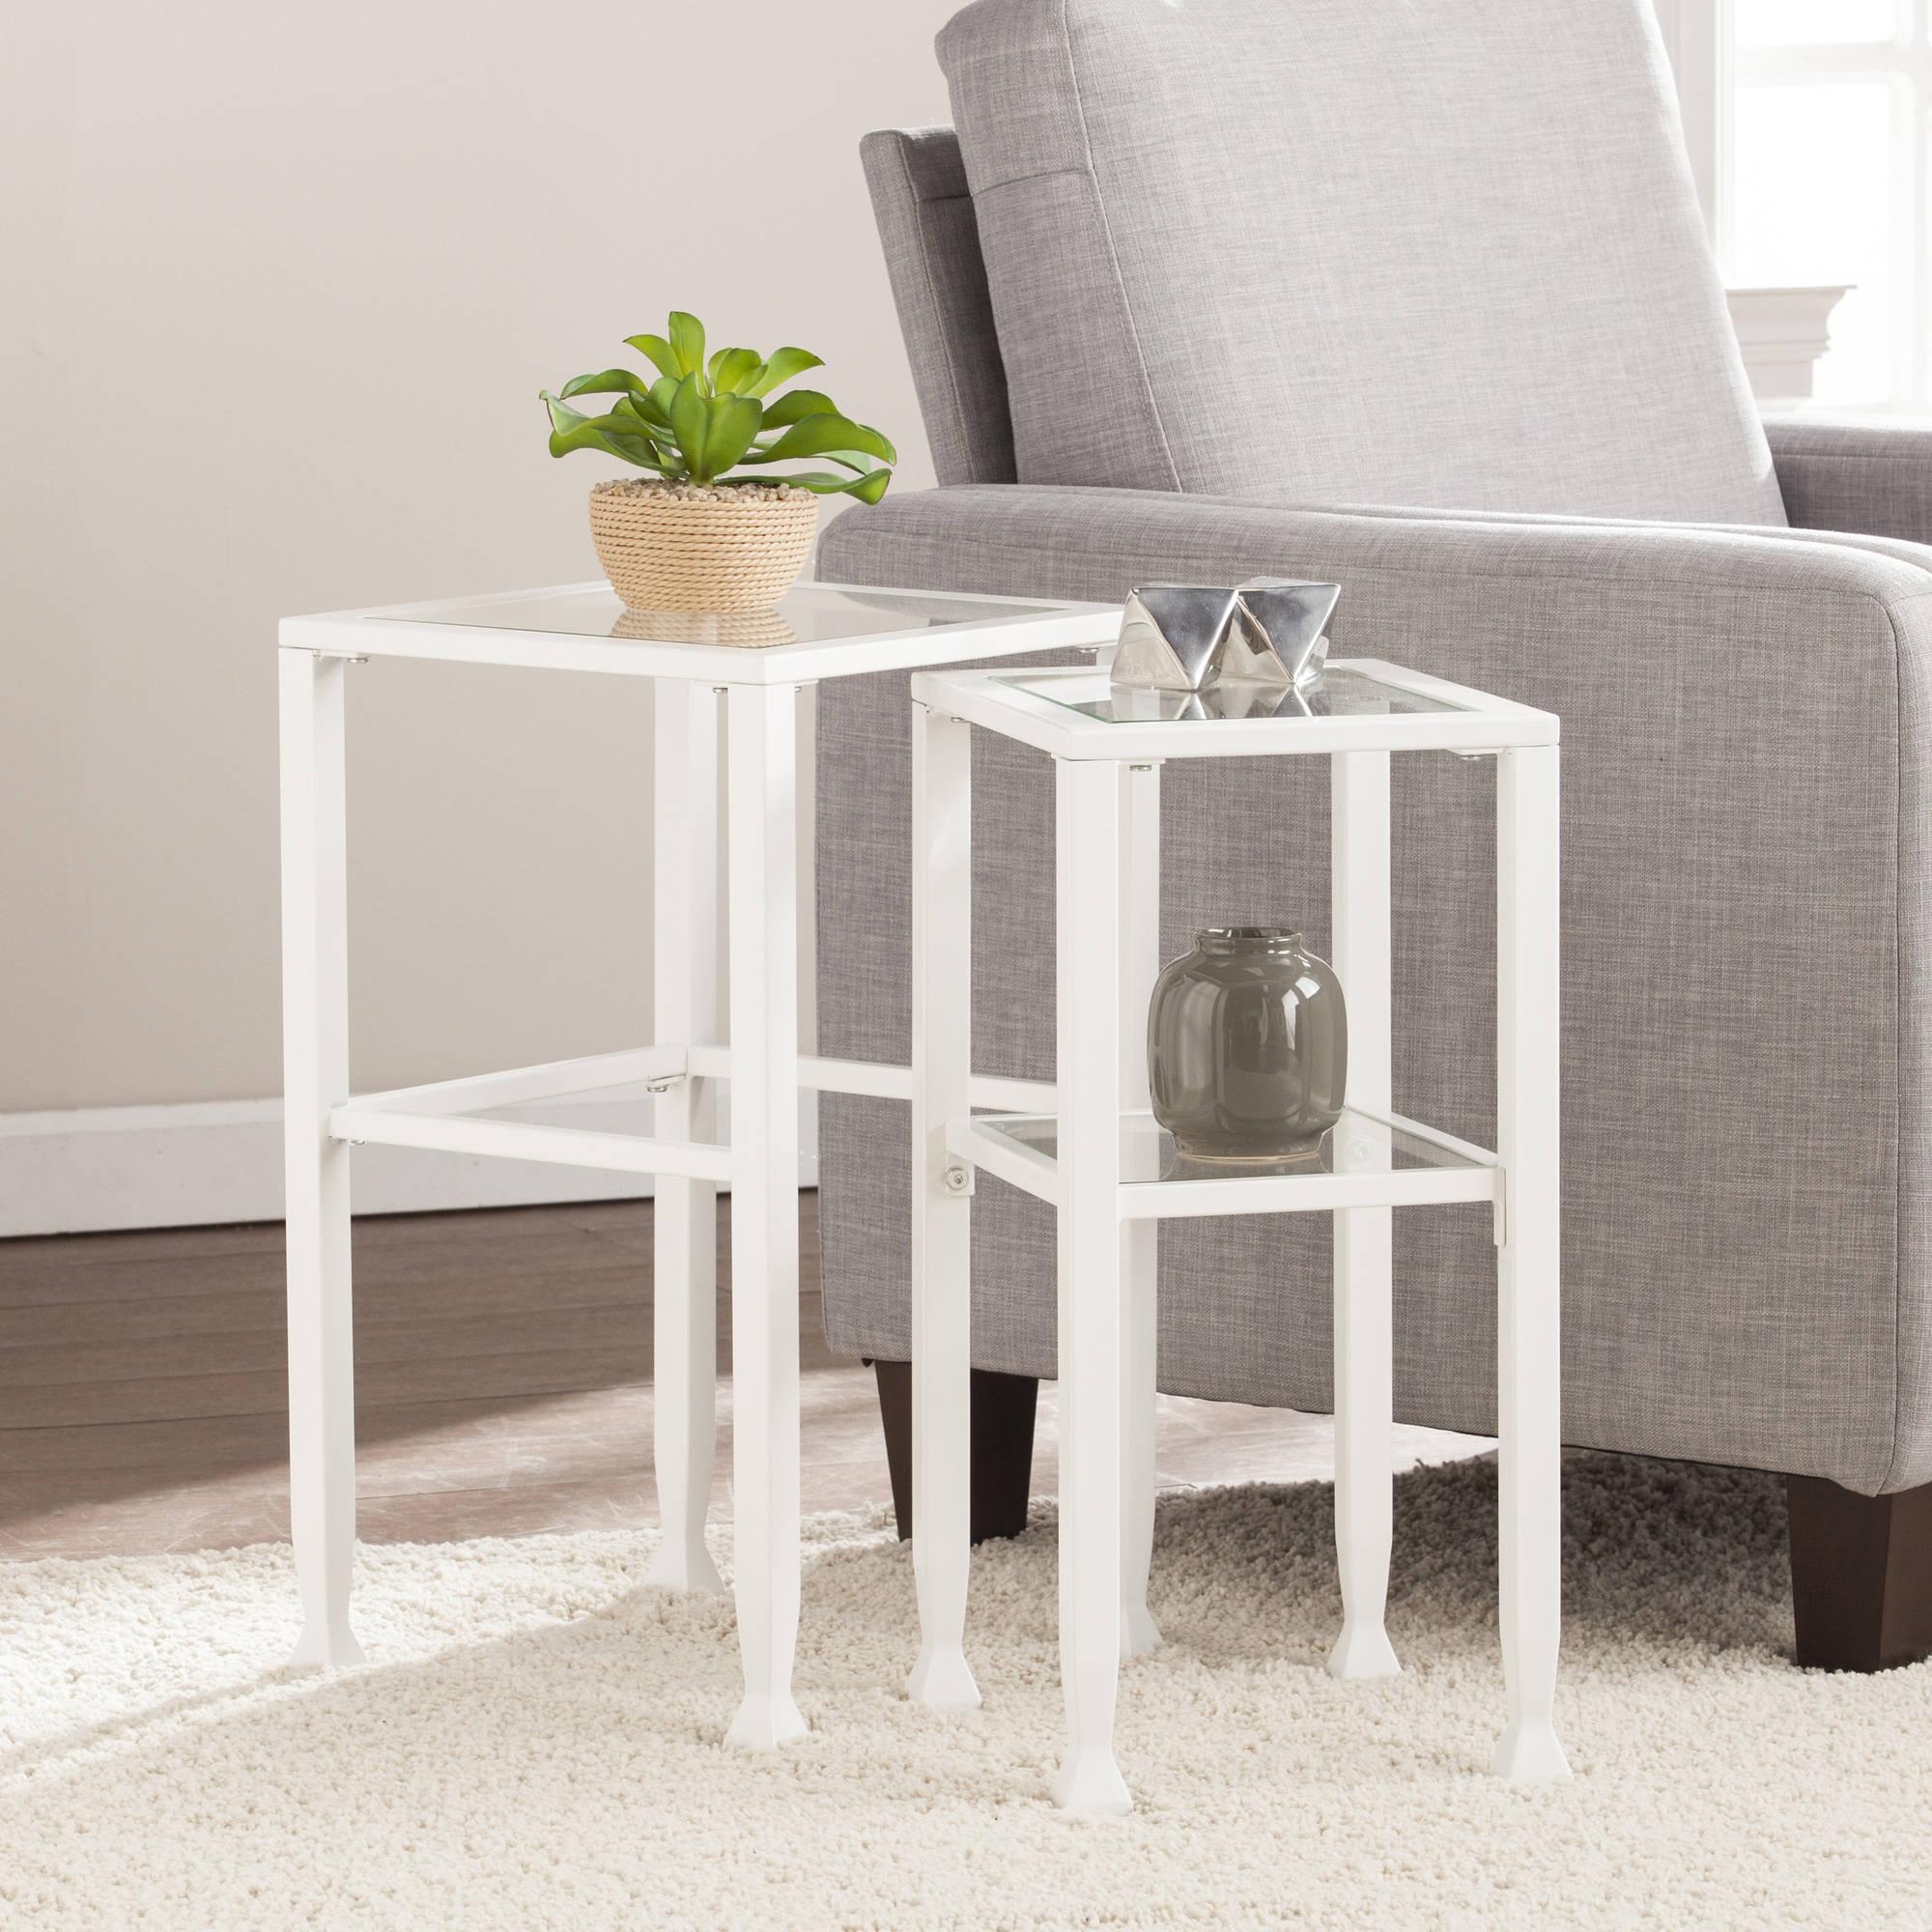 Southern Enterprises Jumpluff Metal/Glass Contemporary 2-Piece Nesting Table Set, White